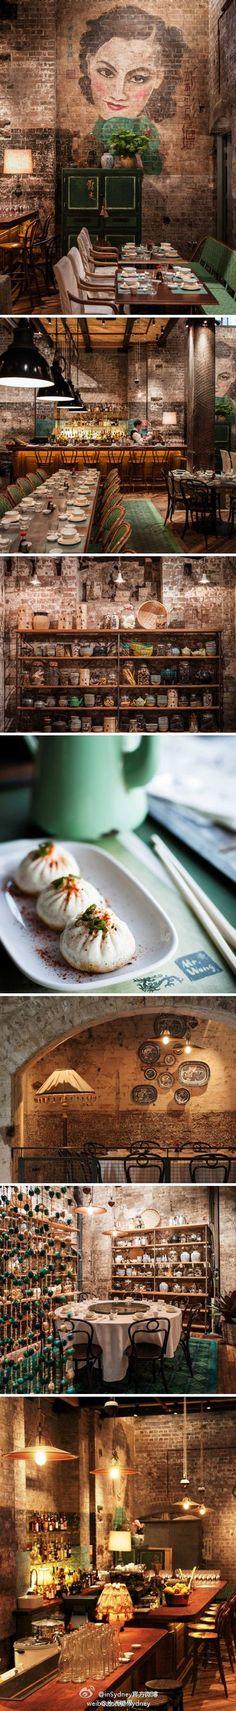 ☆Elysian Chinoiserie Interiors http://www.pinterest.com/joliesarts ∗ Chinese Old Shanghai Style. Restaurant: Mr Wong in Sydney, Australia.